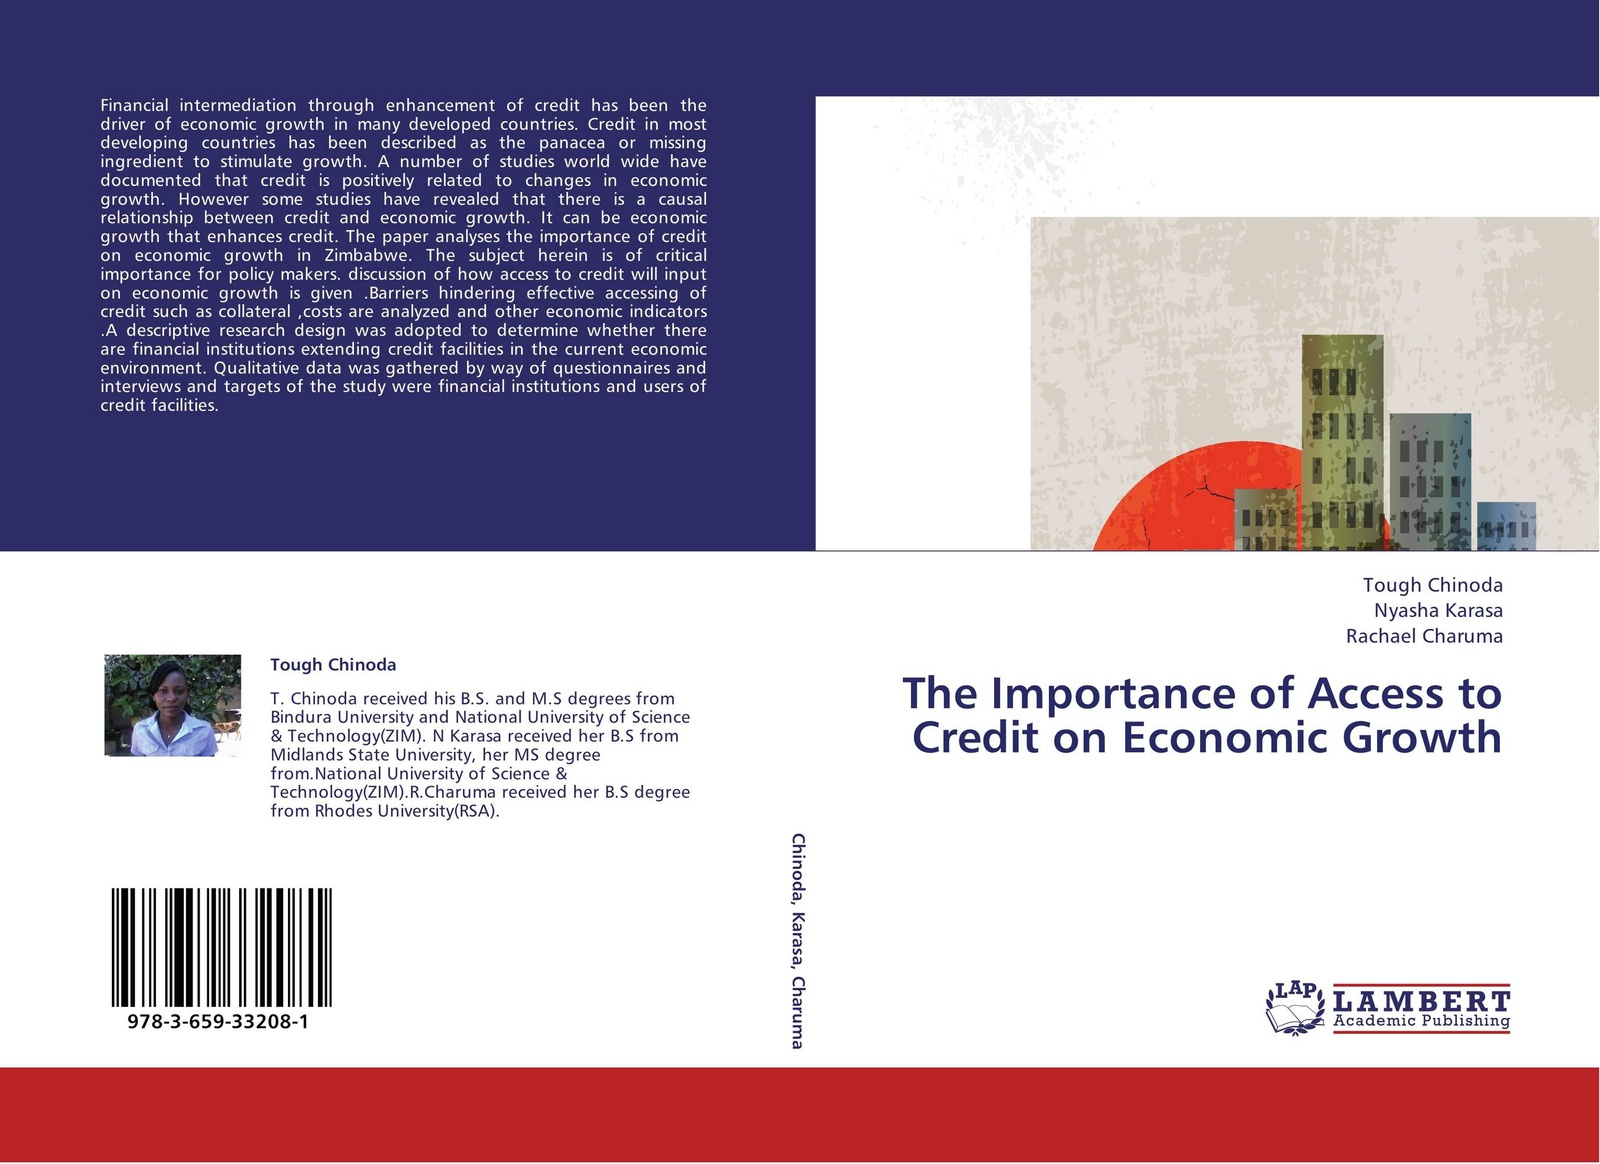 Tough Chinoda,Nyasha Karasa and Rachael Charuma The Importance of Access to Credit on Economic Growth yichen liu financial development and economic growth